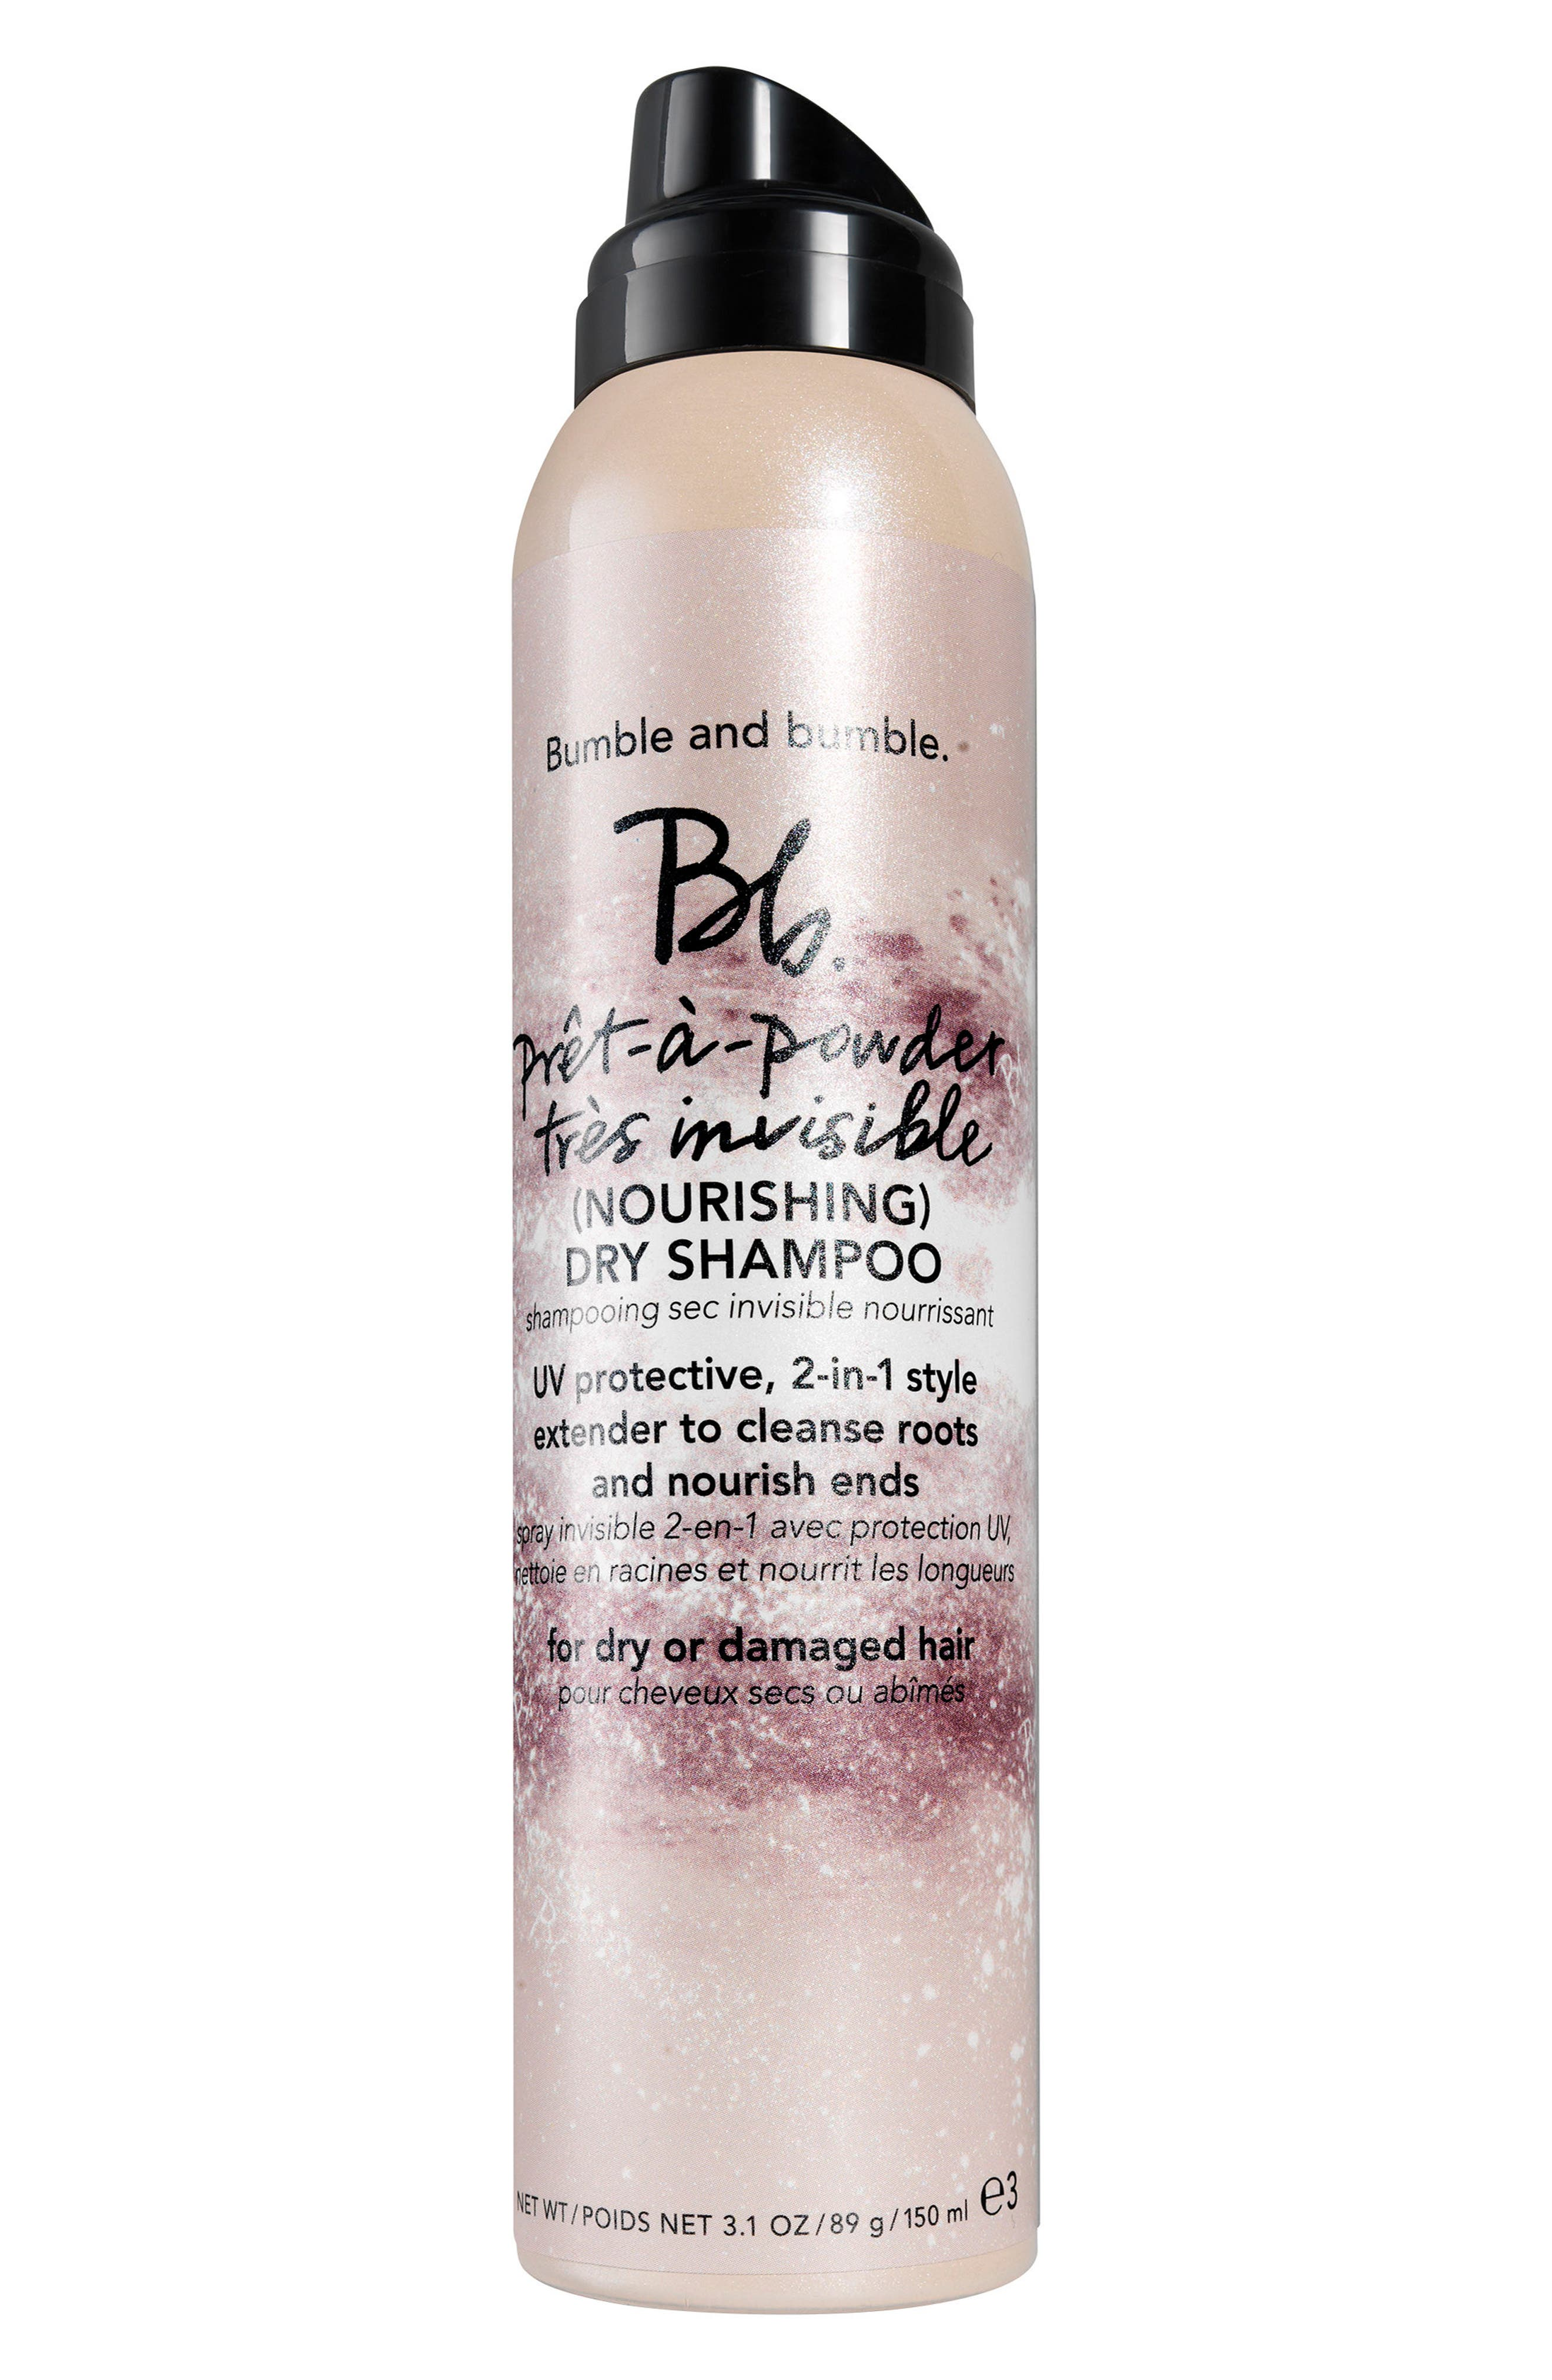 Prêt-a-Powder Très Invisible Nourishing Dry Shampoo,                         Main,                         color, NO COLOR